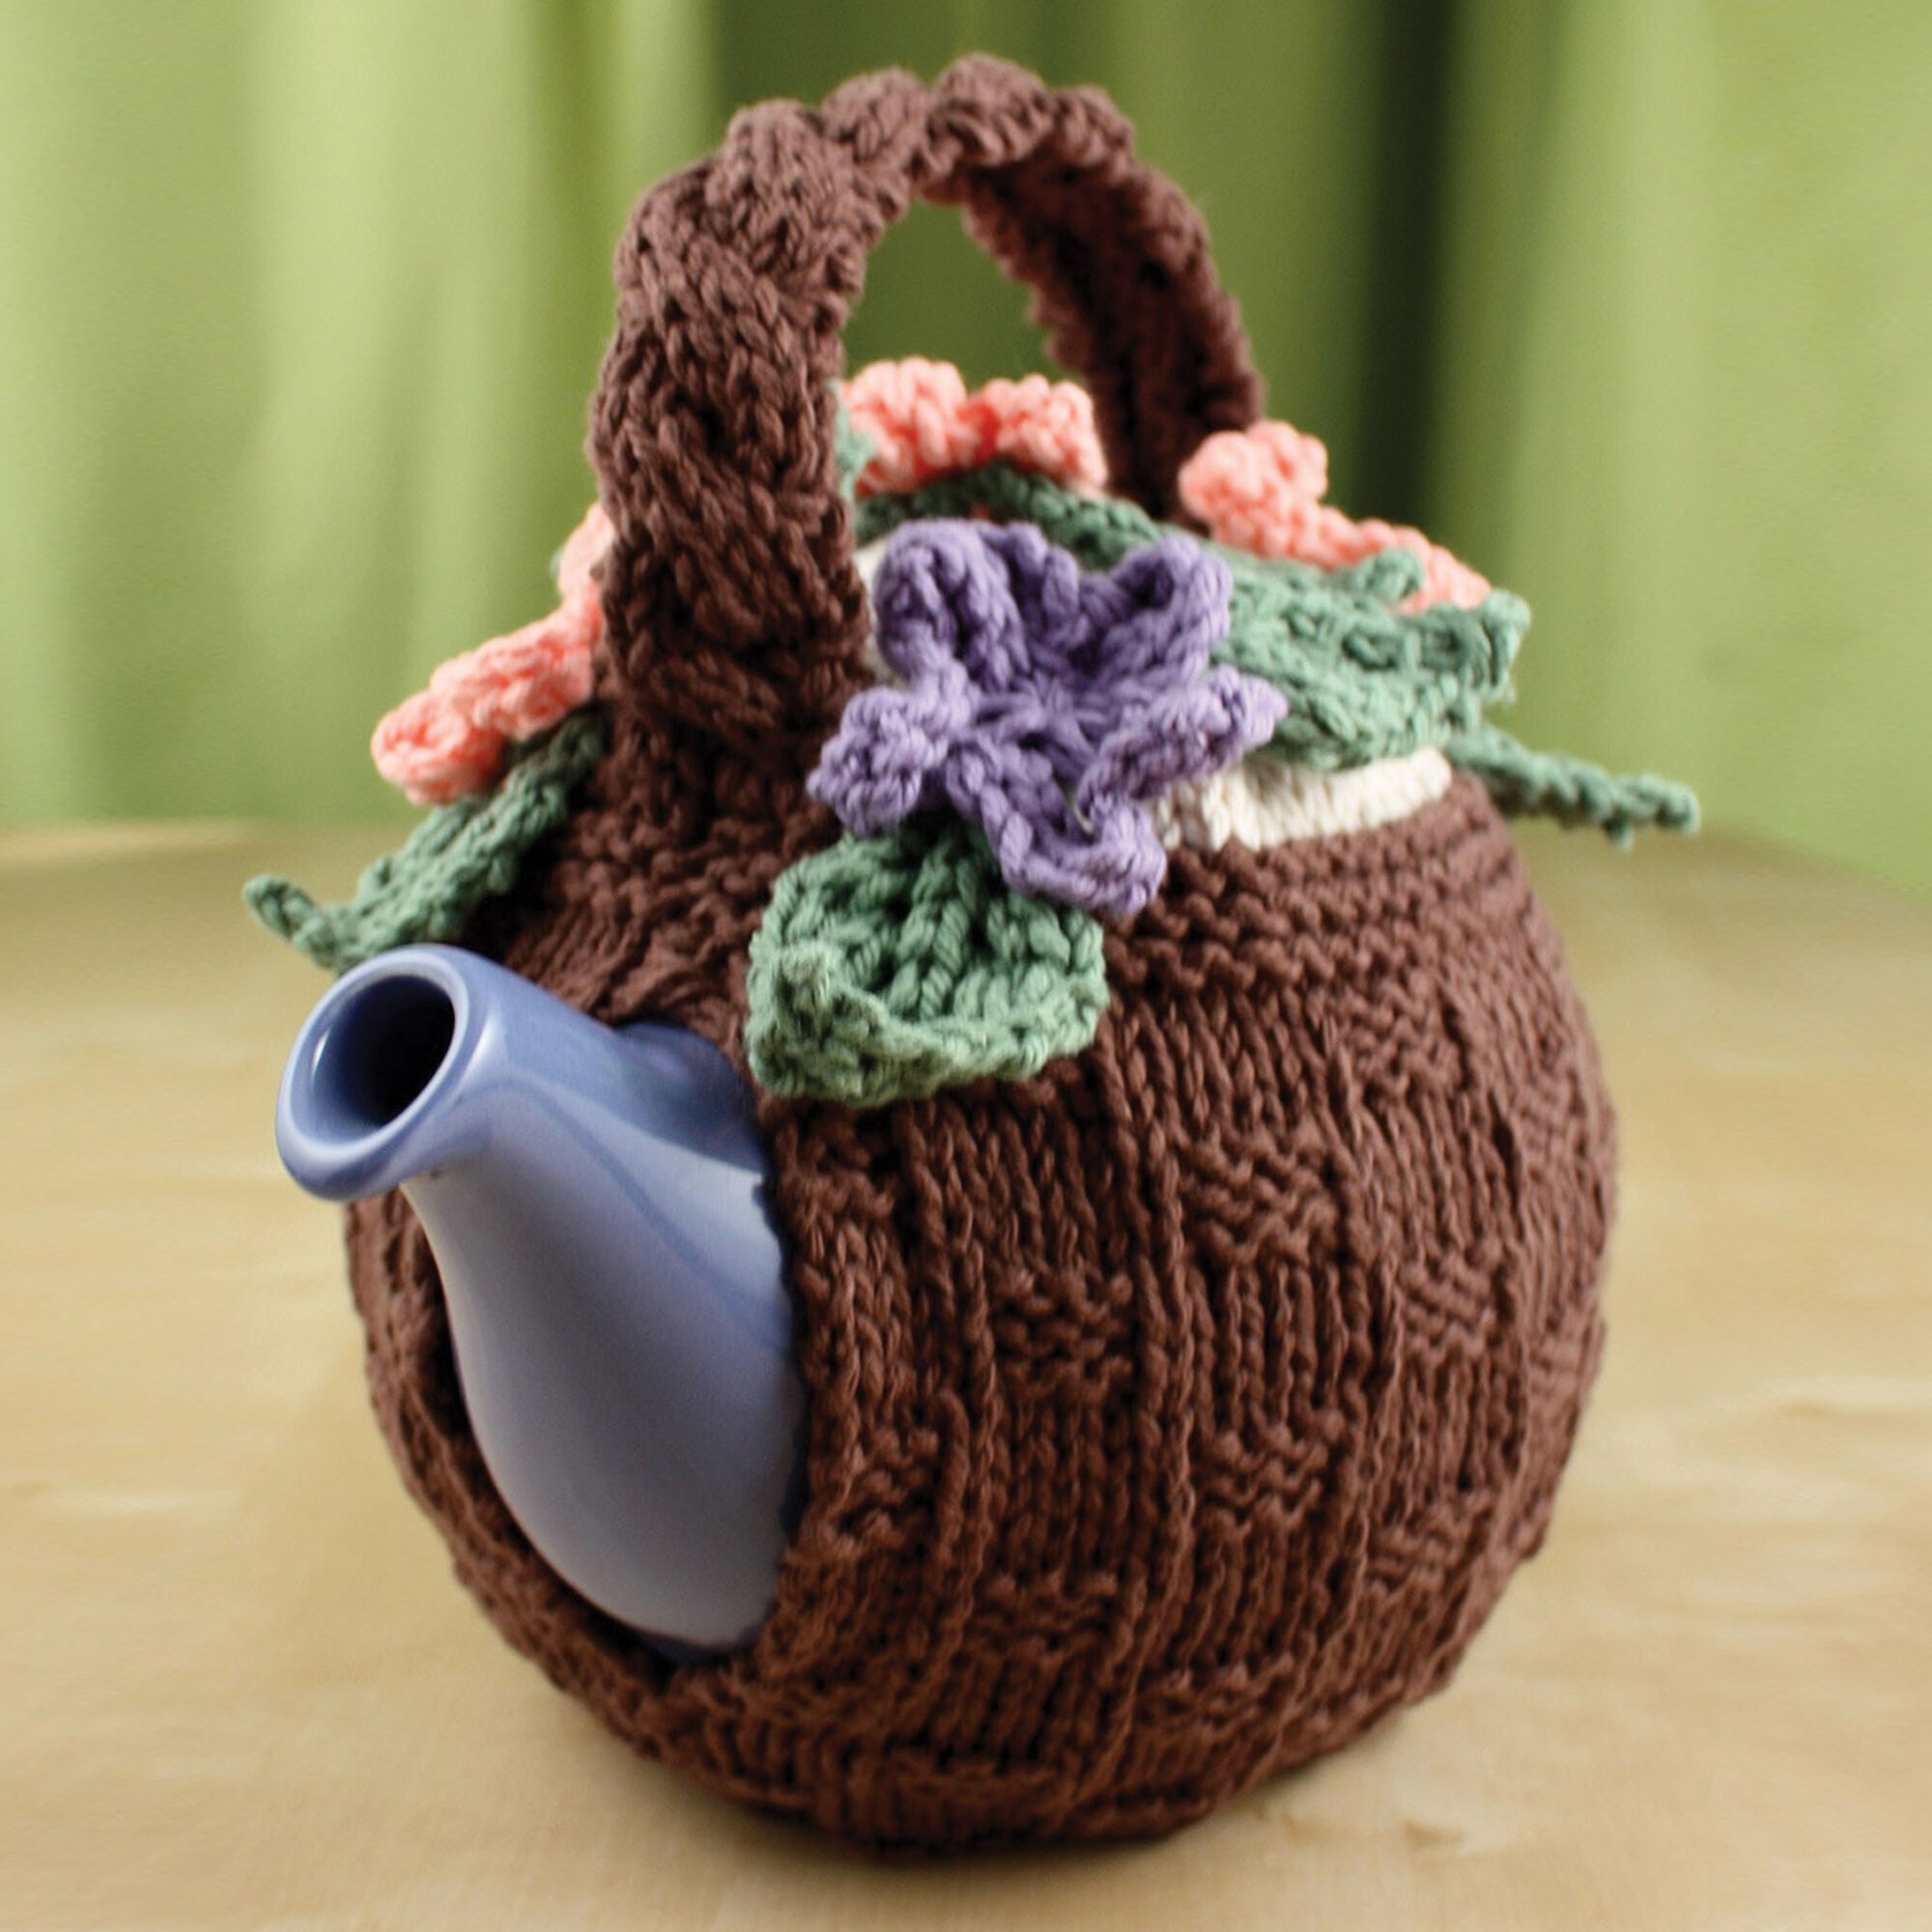 Lily Sugarn Cream Flower Basket Tea Cozy Yarnspirations